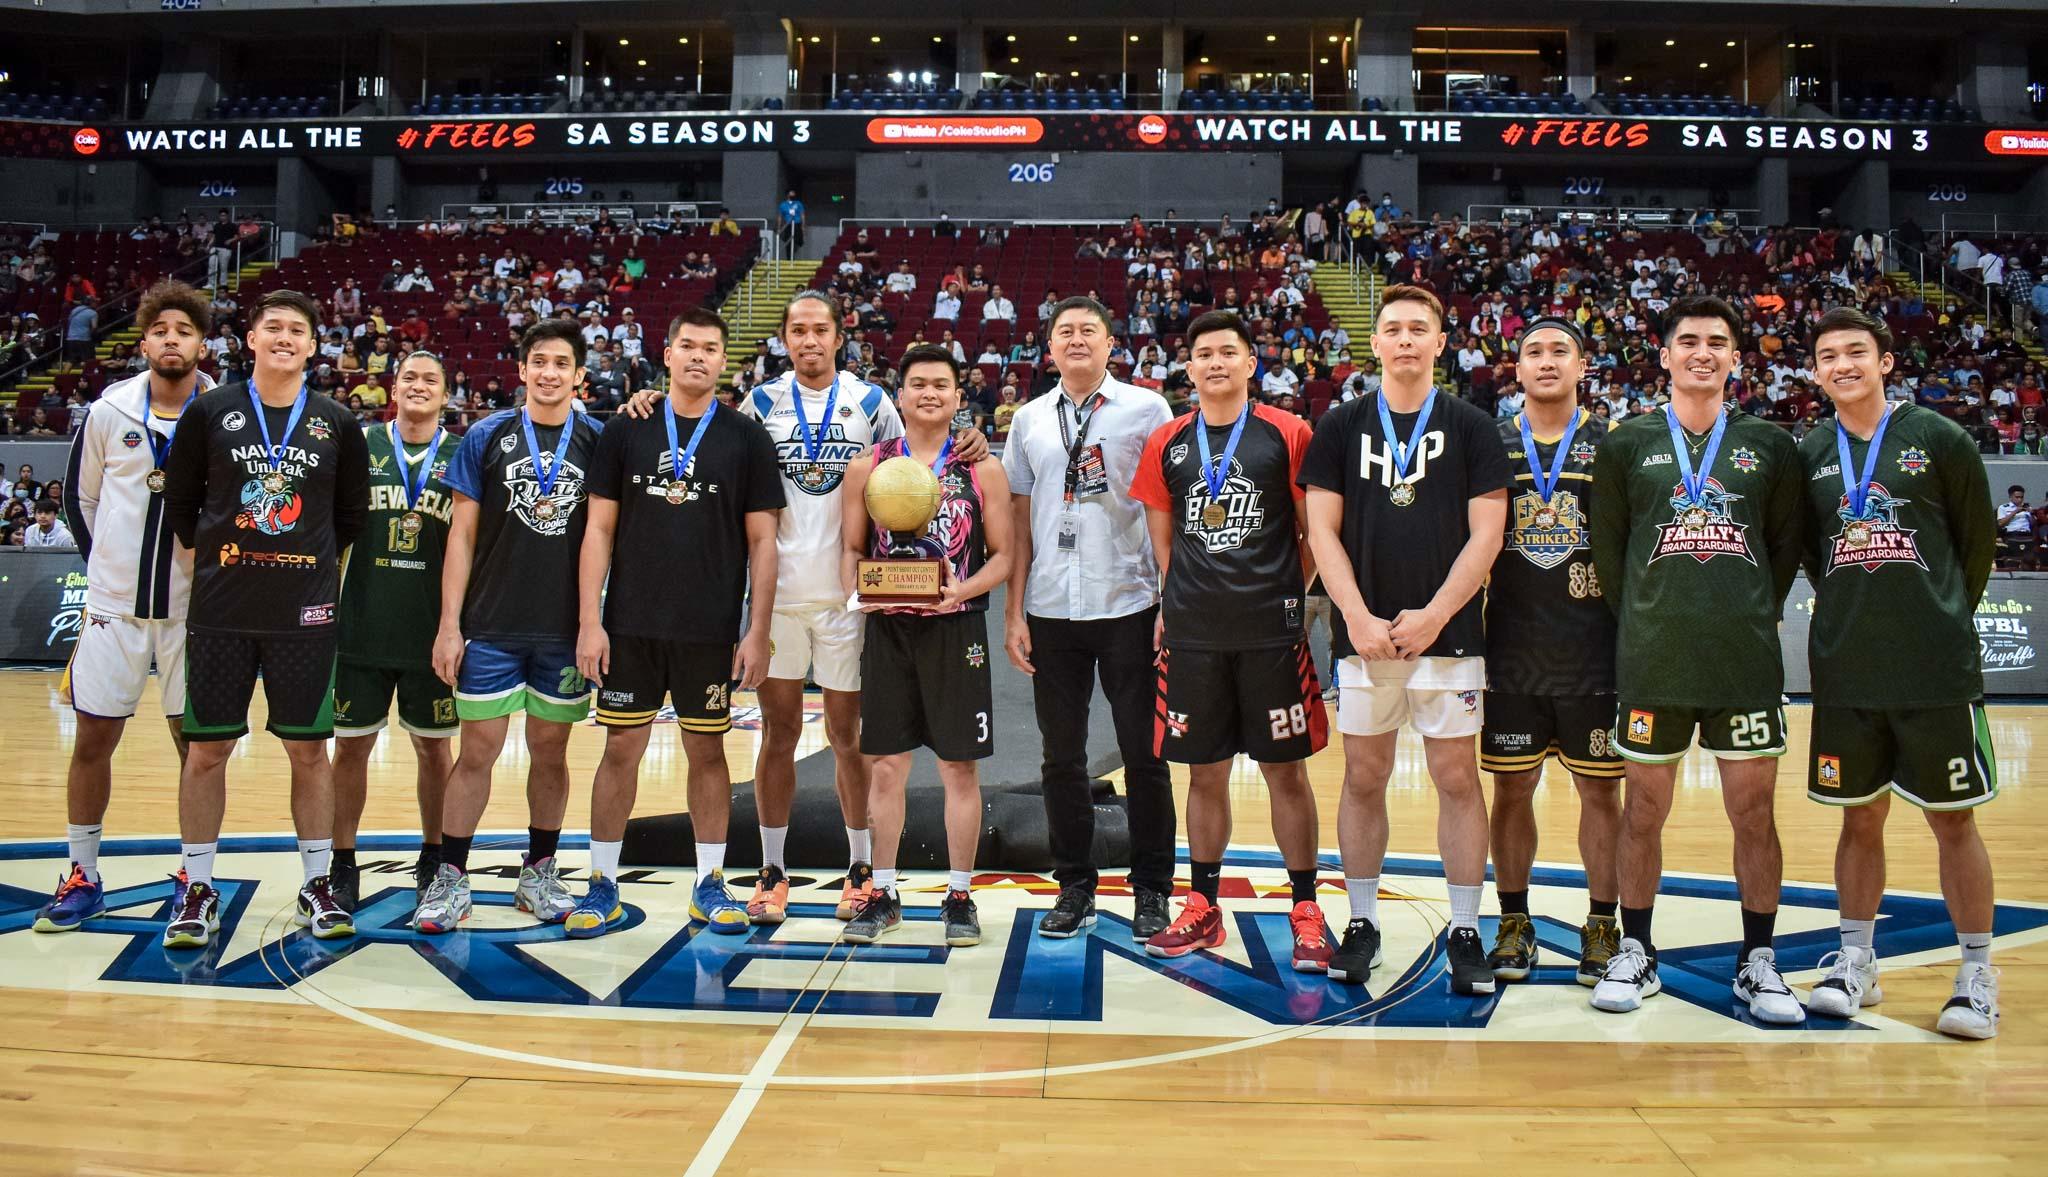 MPBL-2019-2020-AllStarGame-3pt-Shootout-16TH-PHOTO-GROUP-PHOTO Lester Alvarez outsnipes James Martinez, rules MPBL Three-point Shootout Uncategorized  - philippine sports news